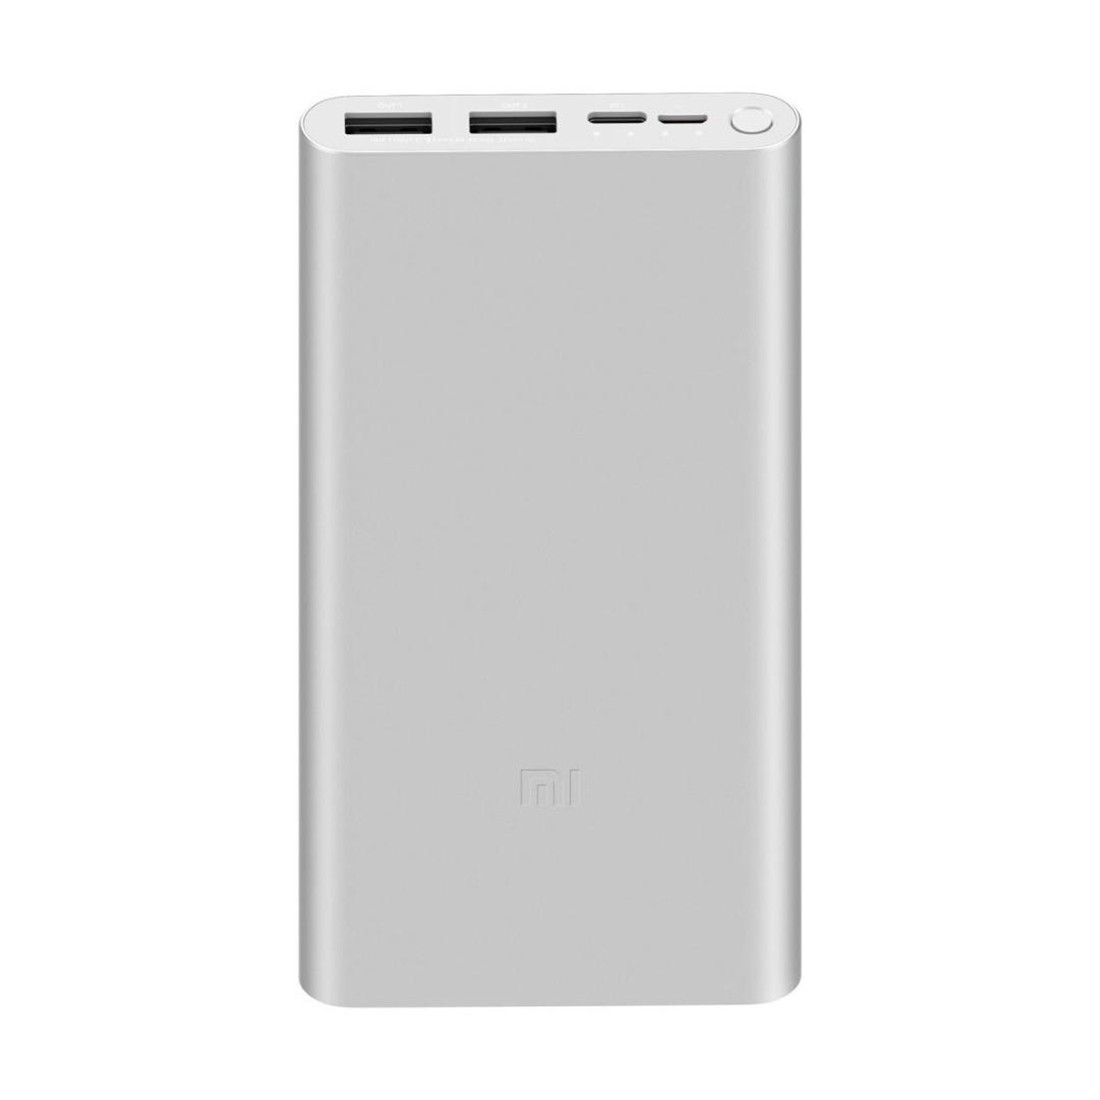 Портативное зарядное устройство Xiaomi Mi Power Bank 10000mAh 3 (2019 Type-C) (PLM13ZM) Серебристый